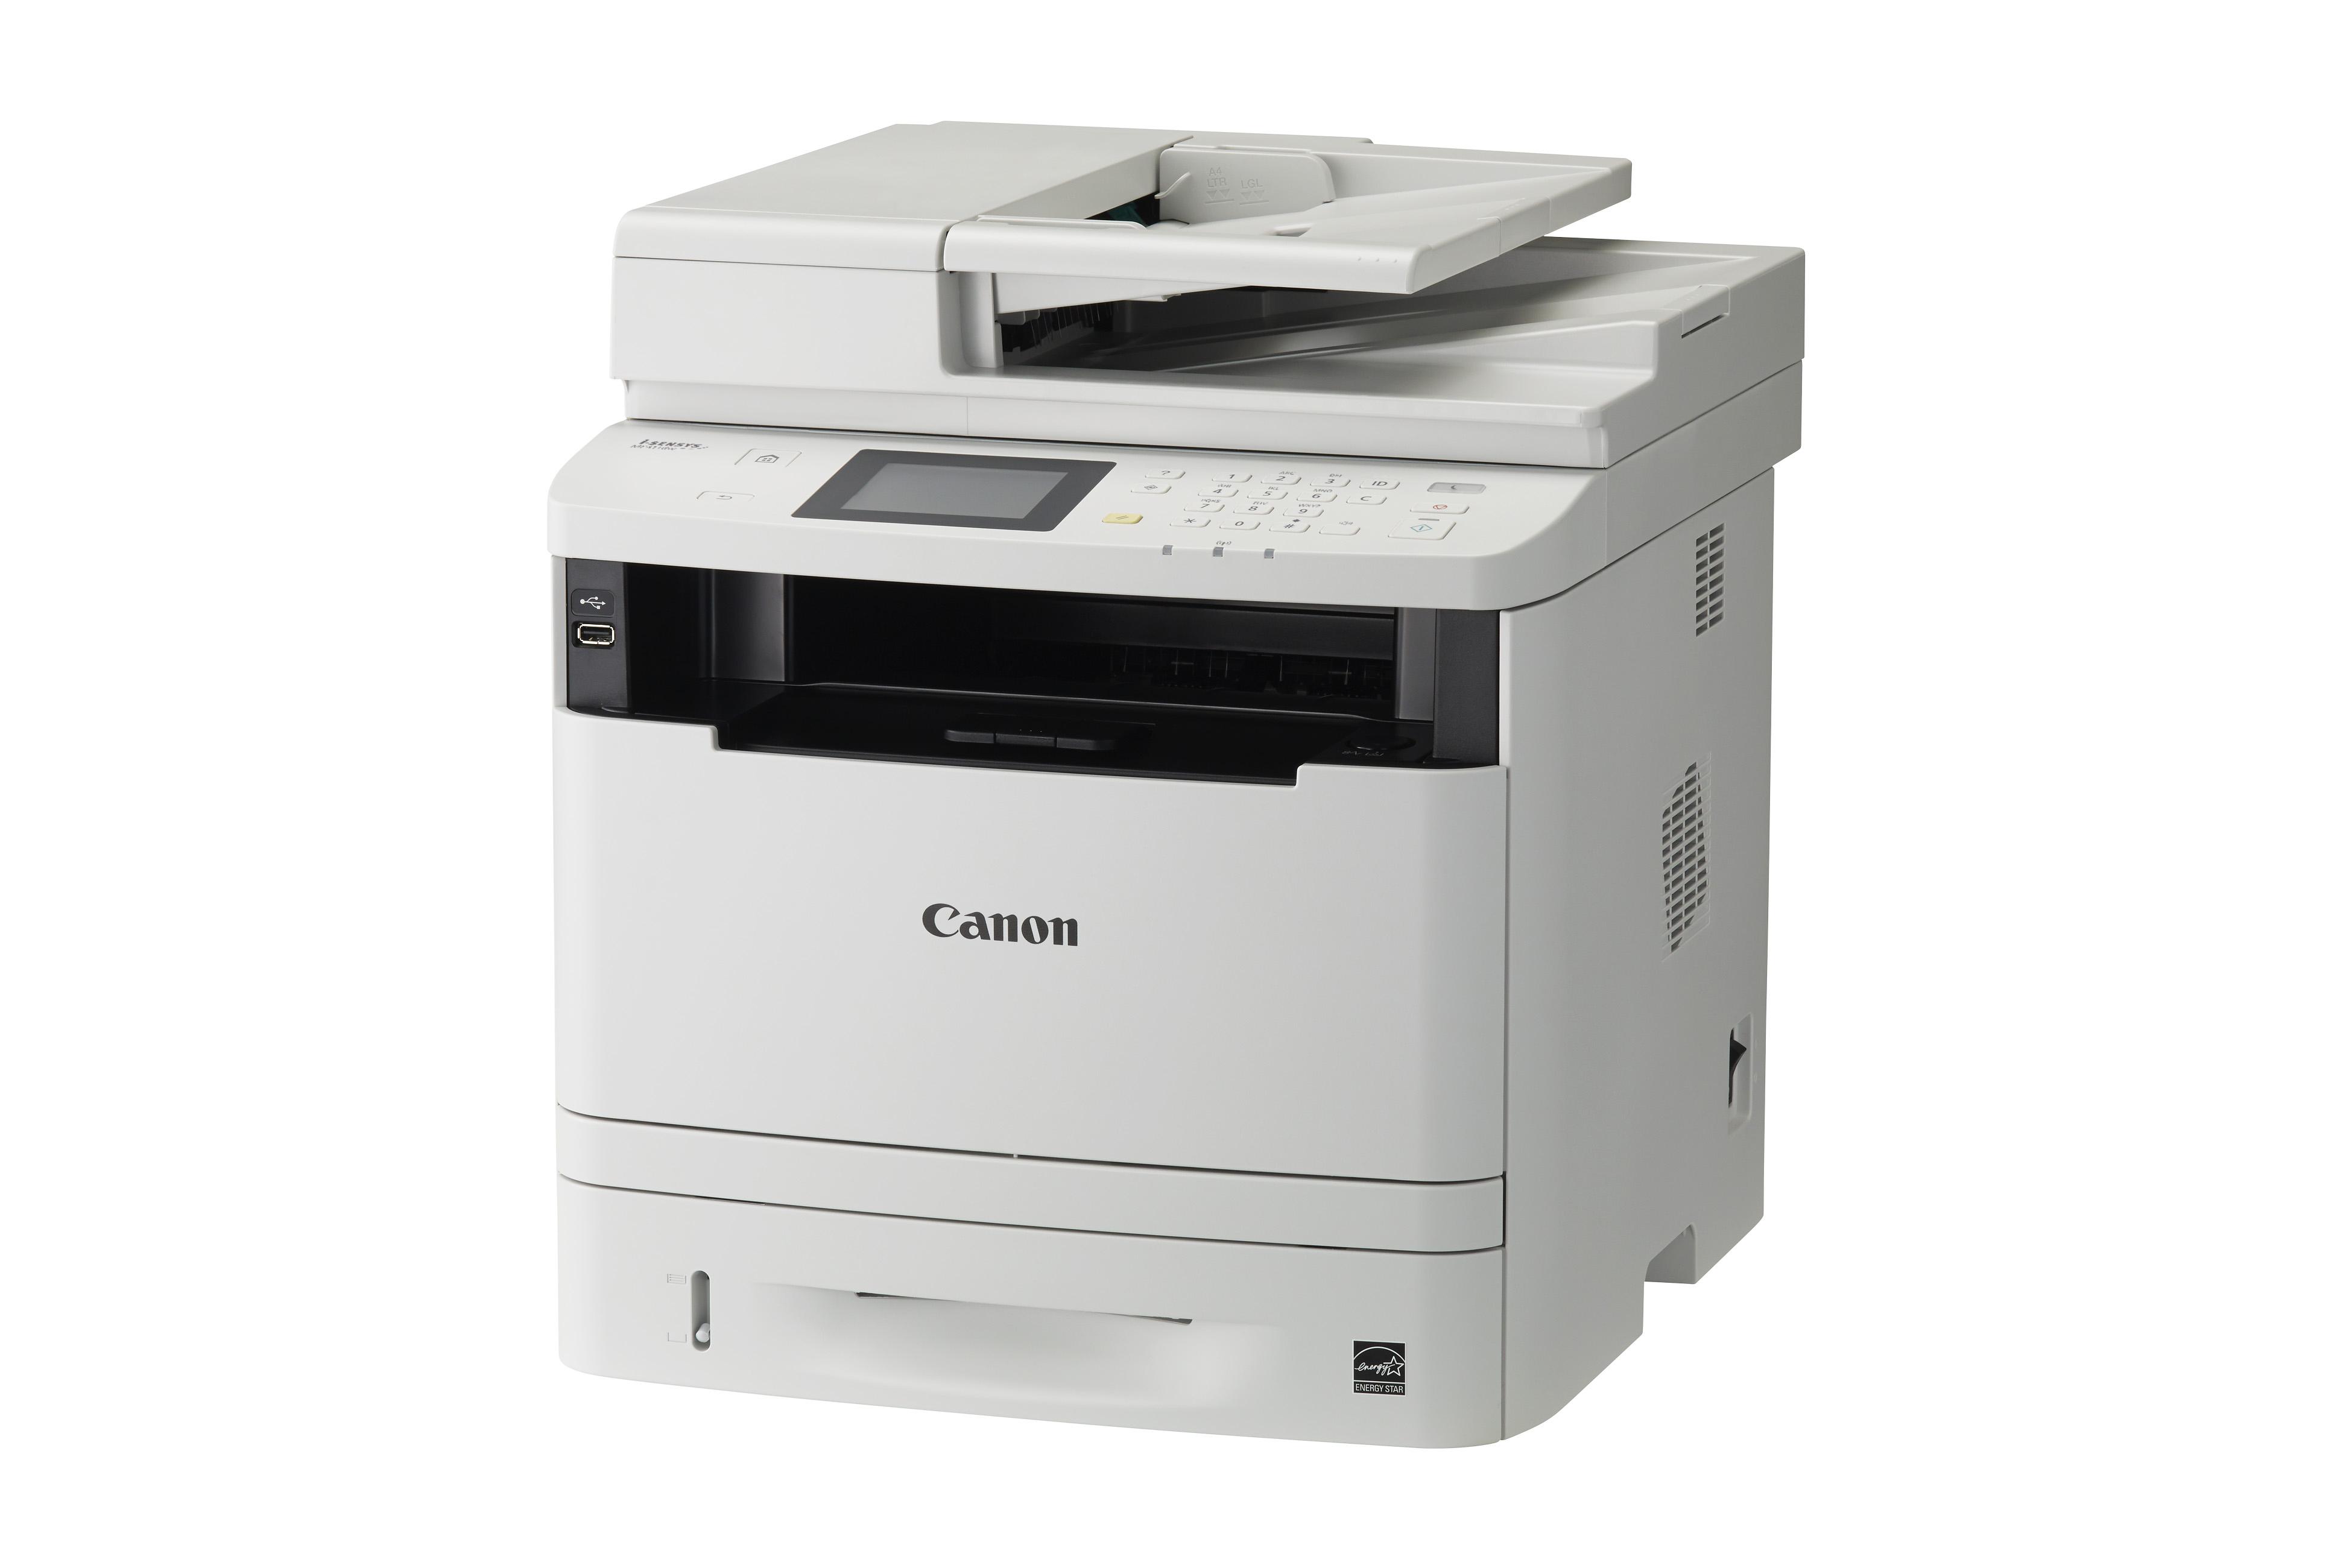 Kserokopiarka Canon i-sensys MF411dw bok